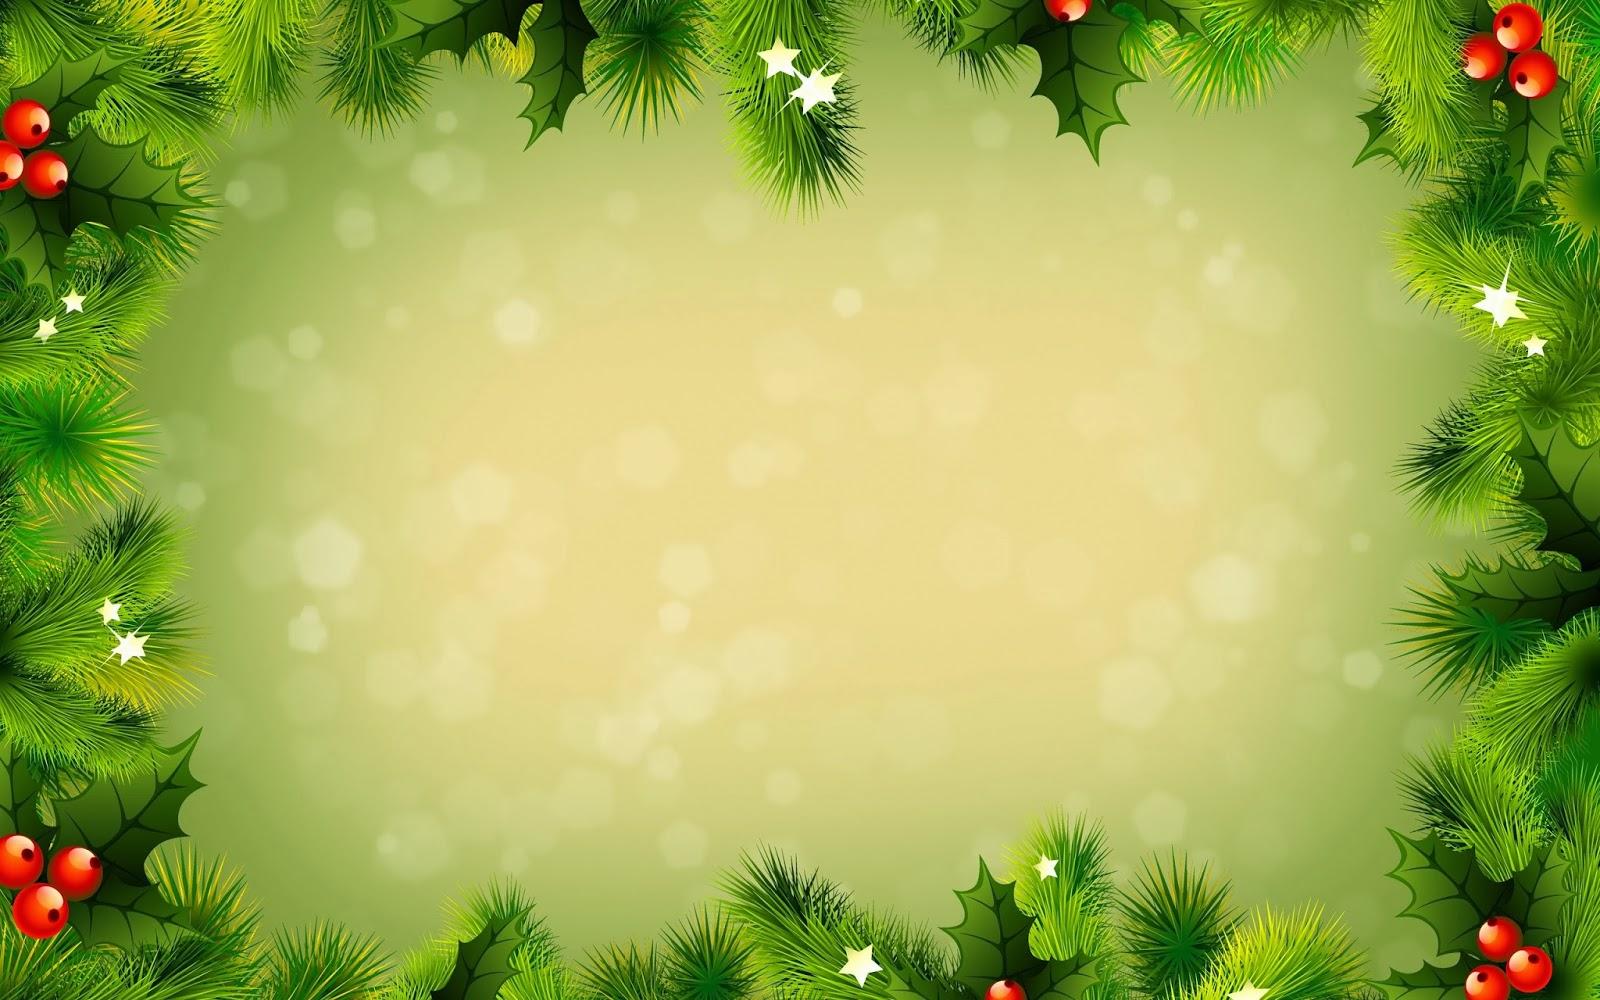 Green Christmas Background HD Wallpaper   HD Wallpapers Blog 1600x1000